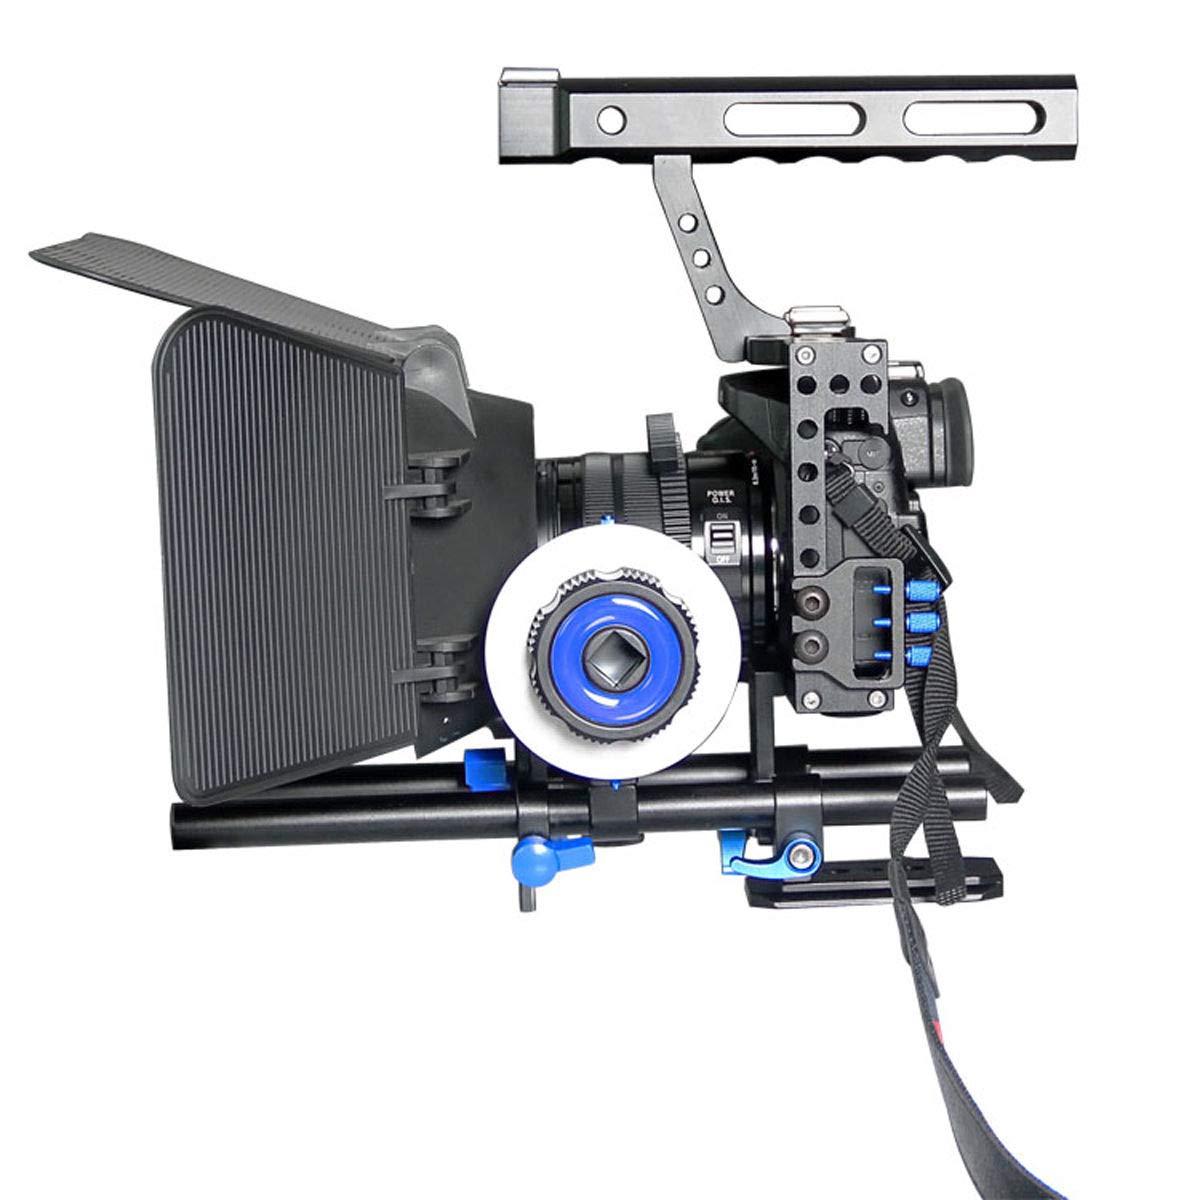 FidgetFidget Stabilizers for DSLR Camera Cage + Follow Focus + Matte Box Kit for Sony A7S A7 A7R A7RII A7SII by FidgetFidget (Image #5)